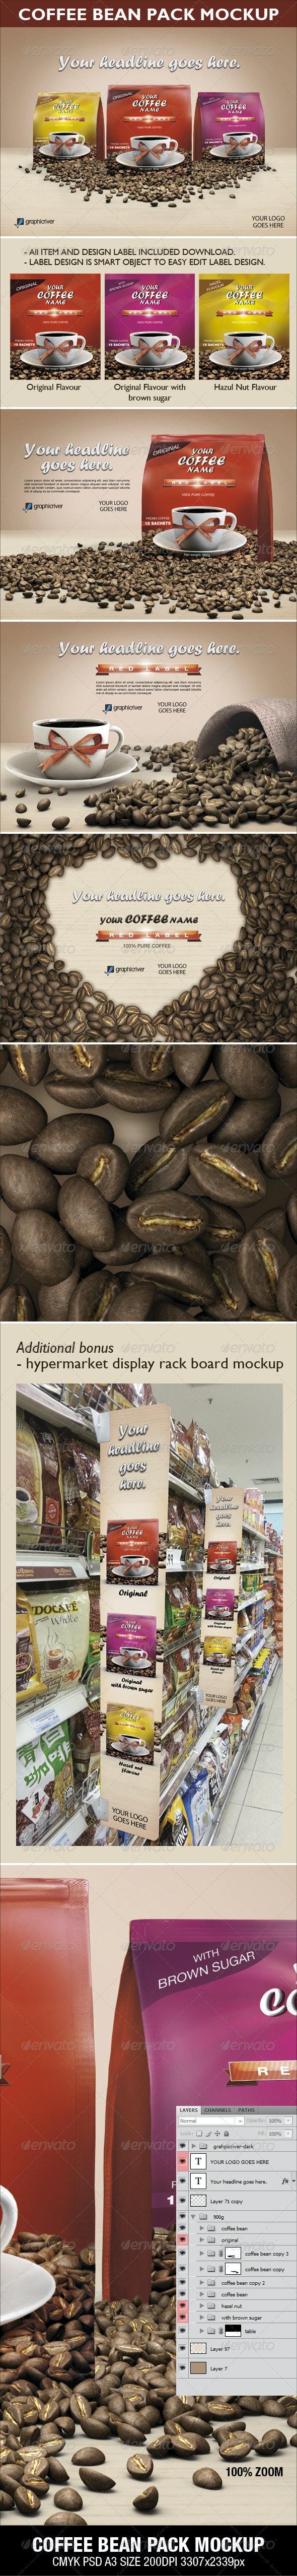 Coffee Bean Pack Mock-up - Food and Drink Packaging